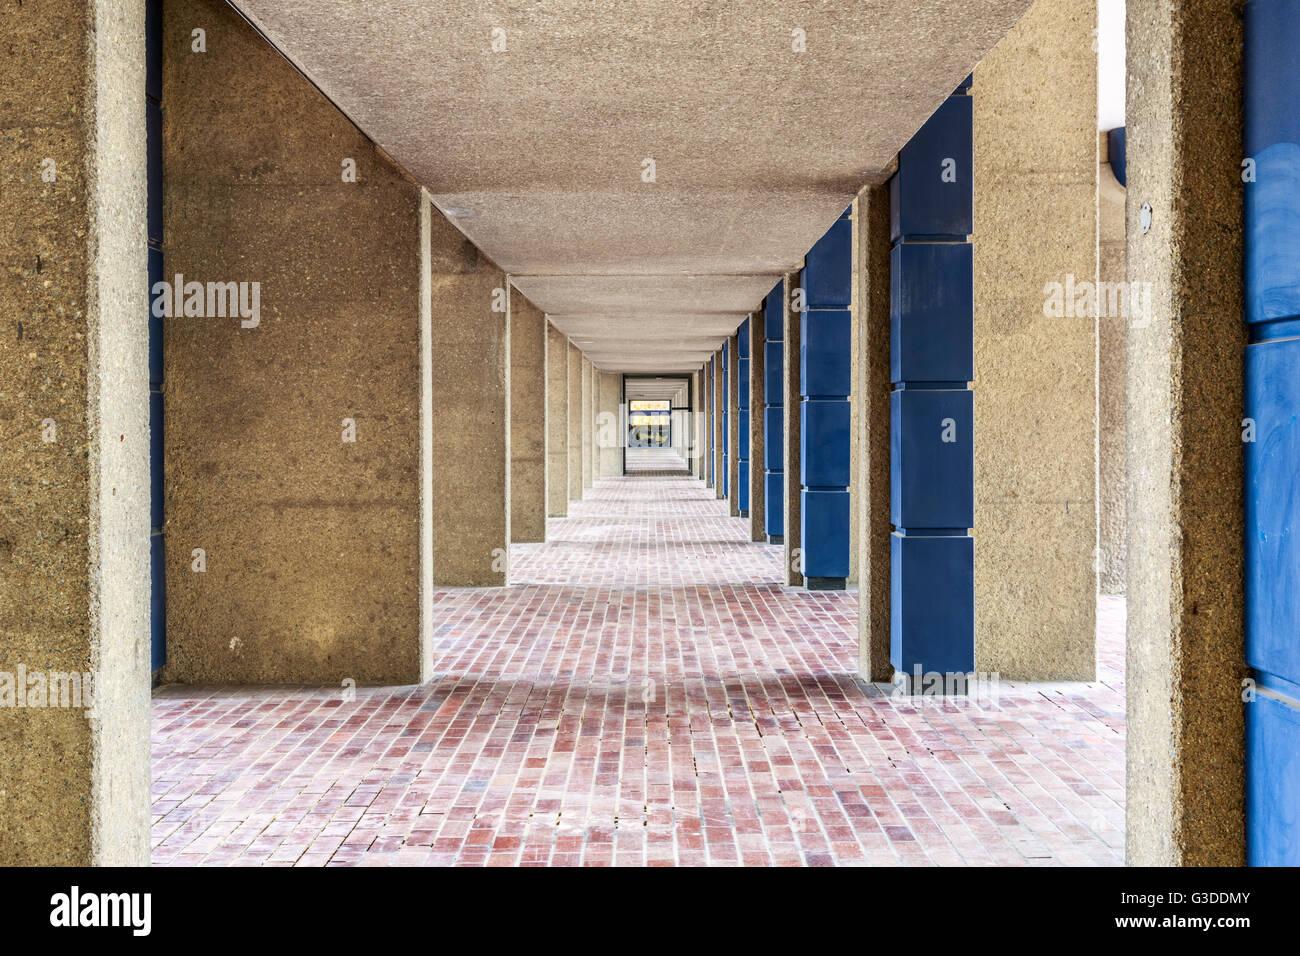 Brutalist architecture, pedestrian hallway in the Barbican Complex, London - Stock Image